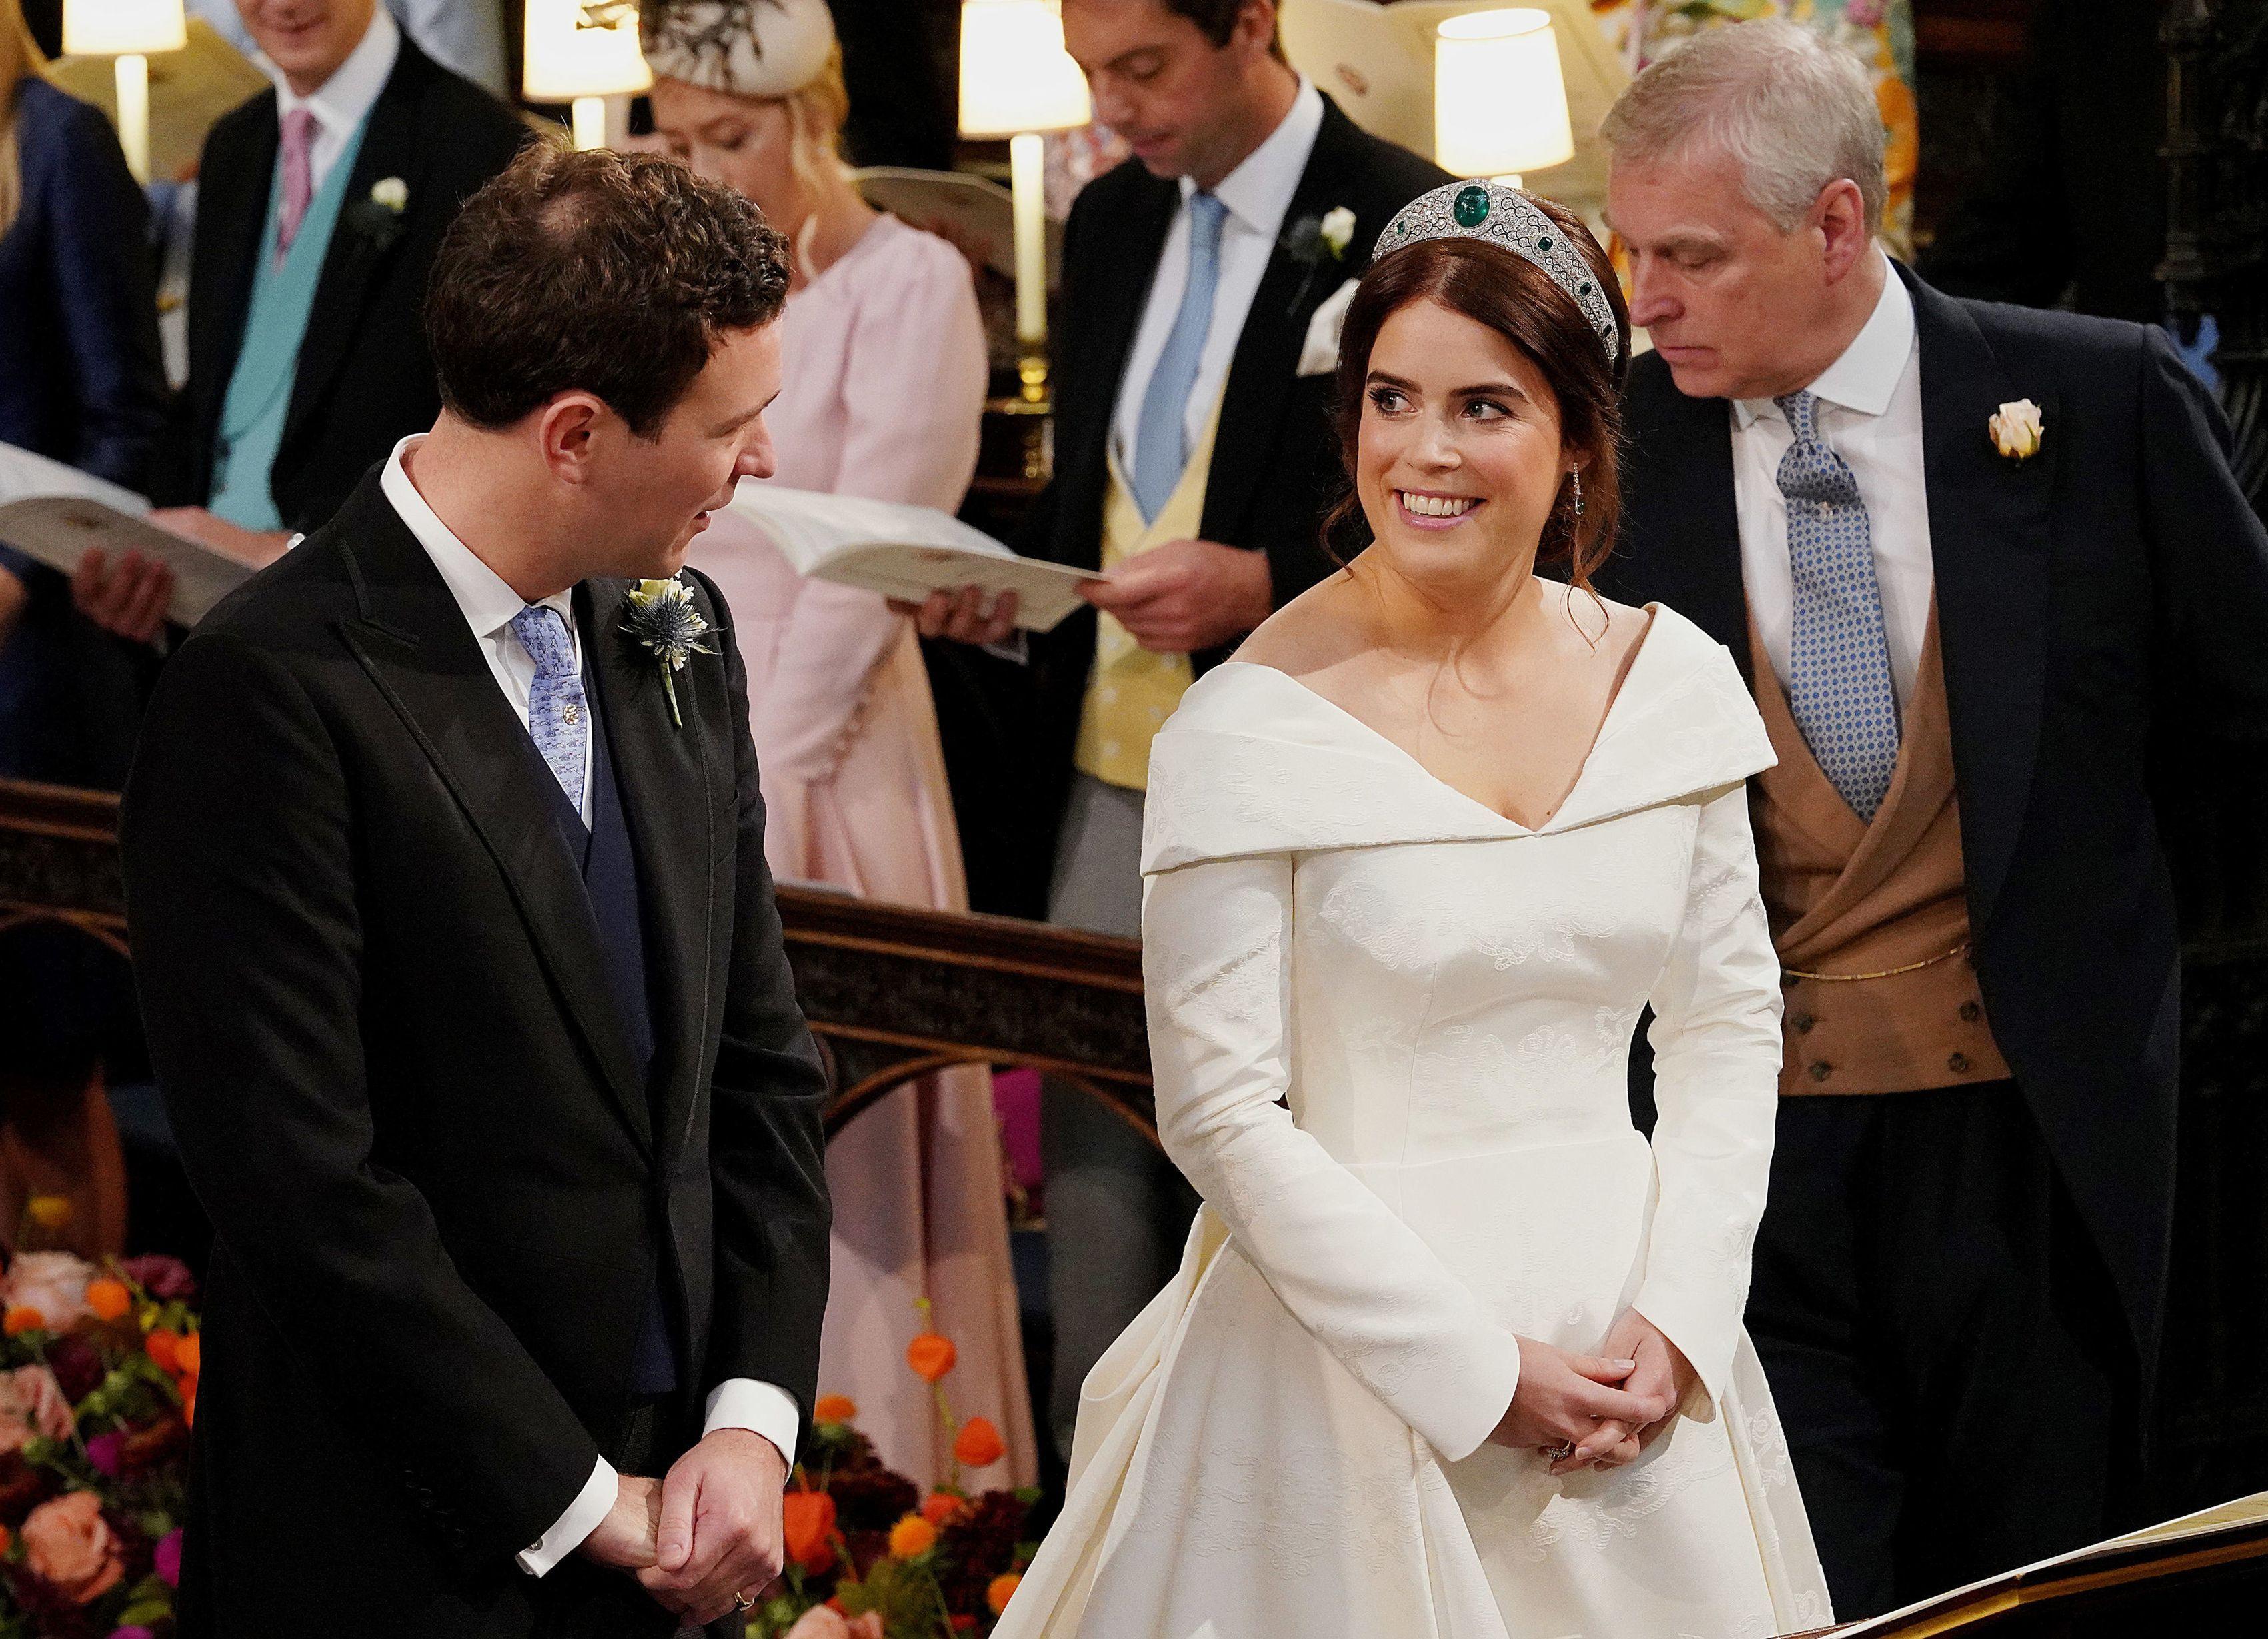 Princess Eugenie S Jack Brooksbank S Wedding Compared To Meghan